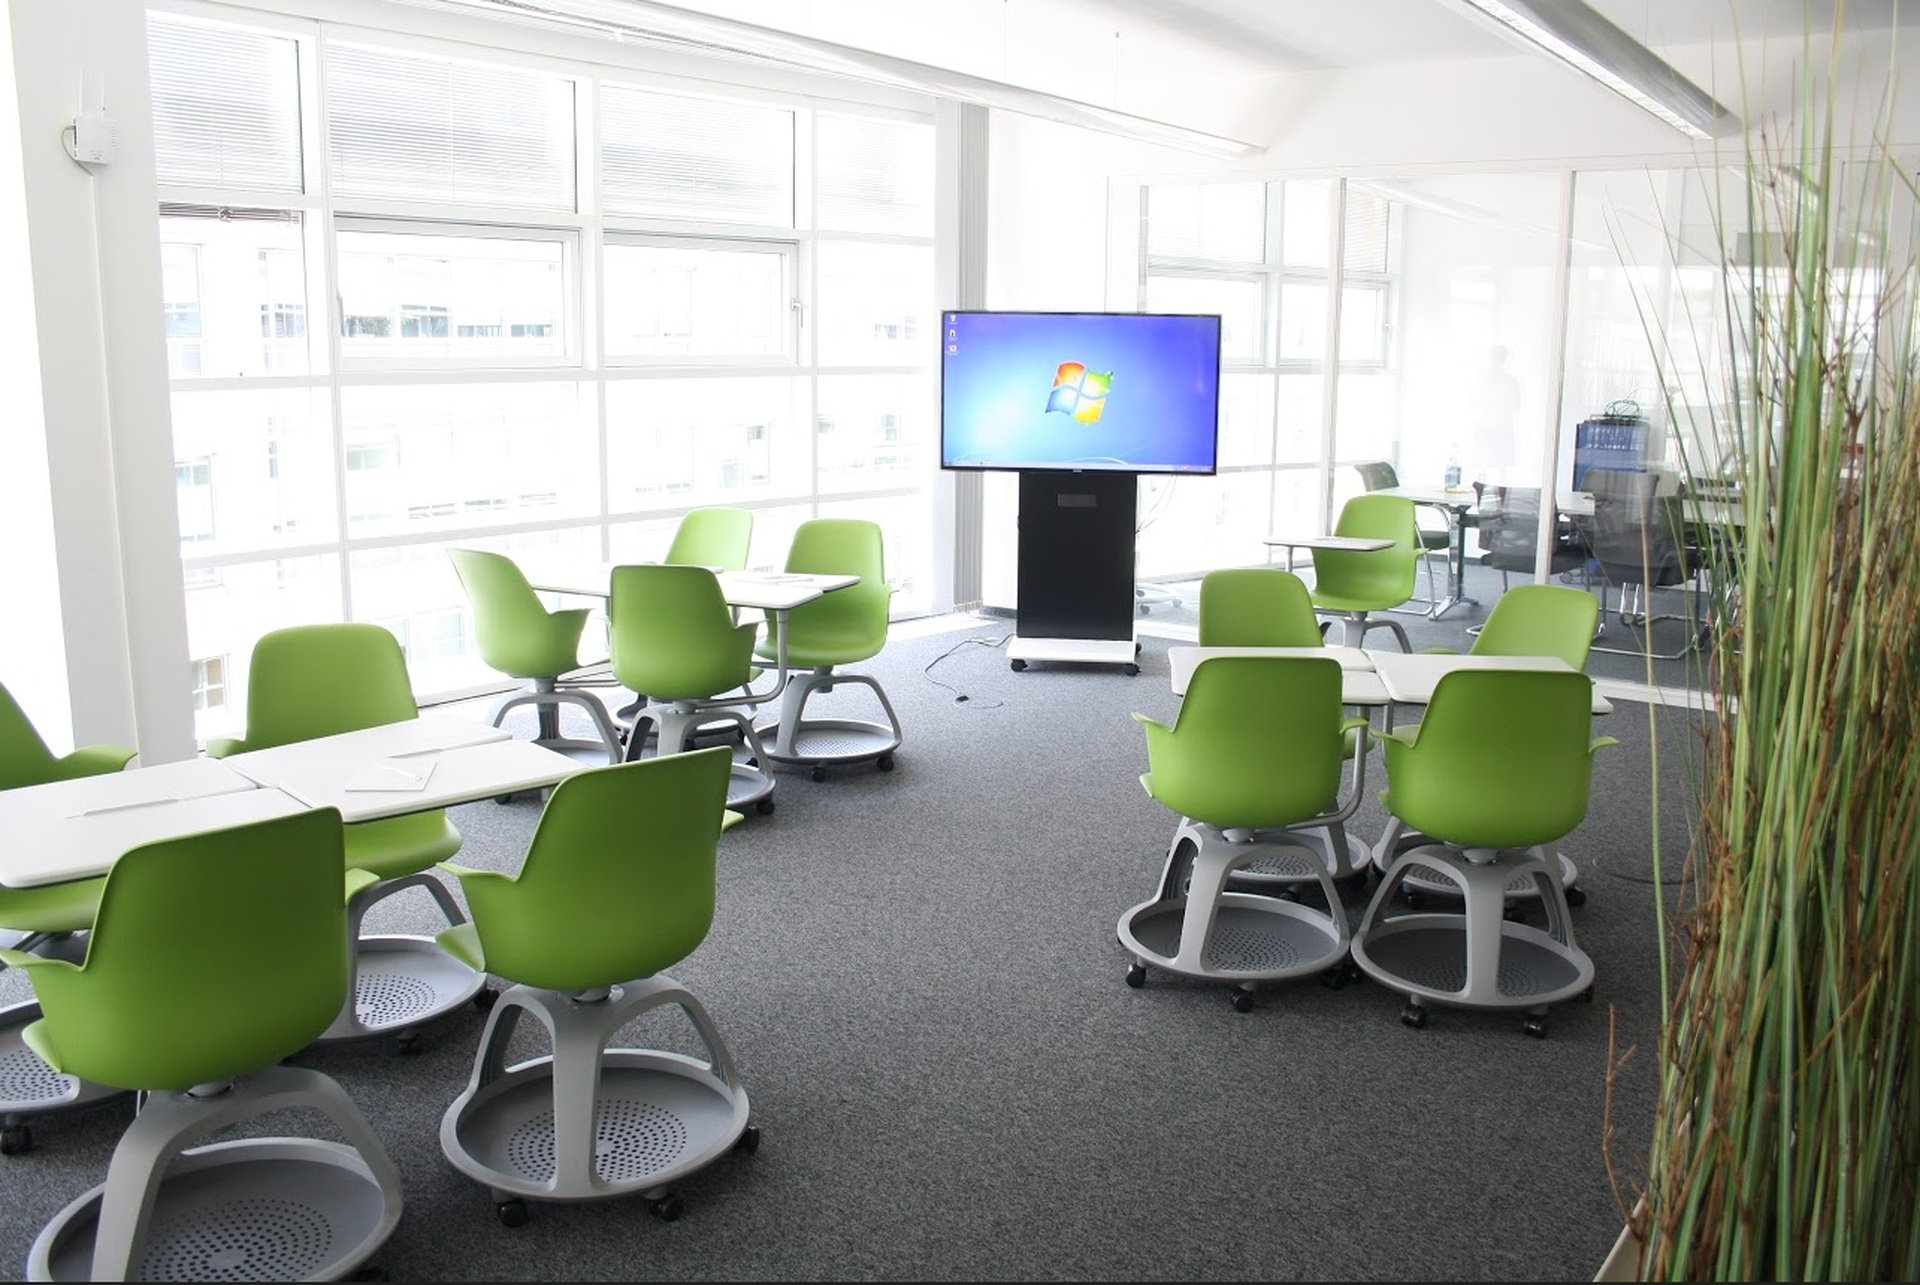 Berlin seminar rooms Meeting room  TÜV Rheinland Campus - Training Room image 0